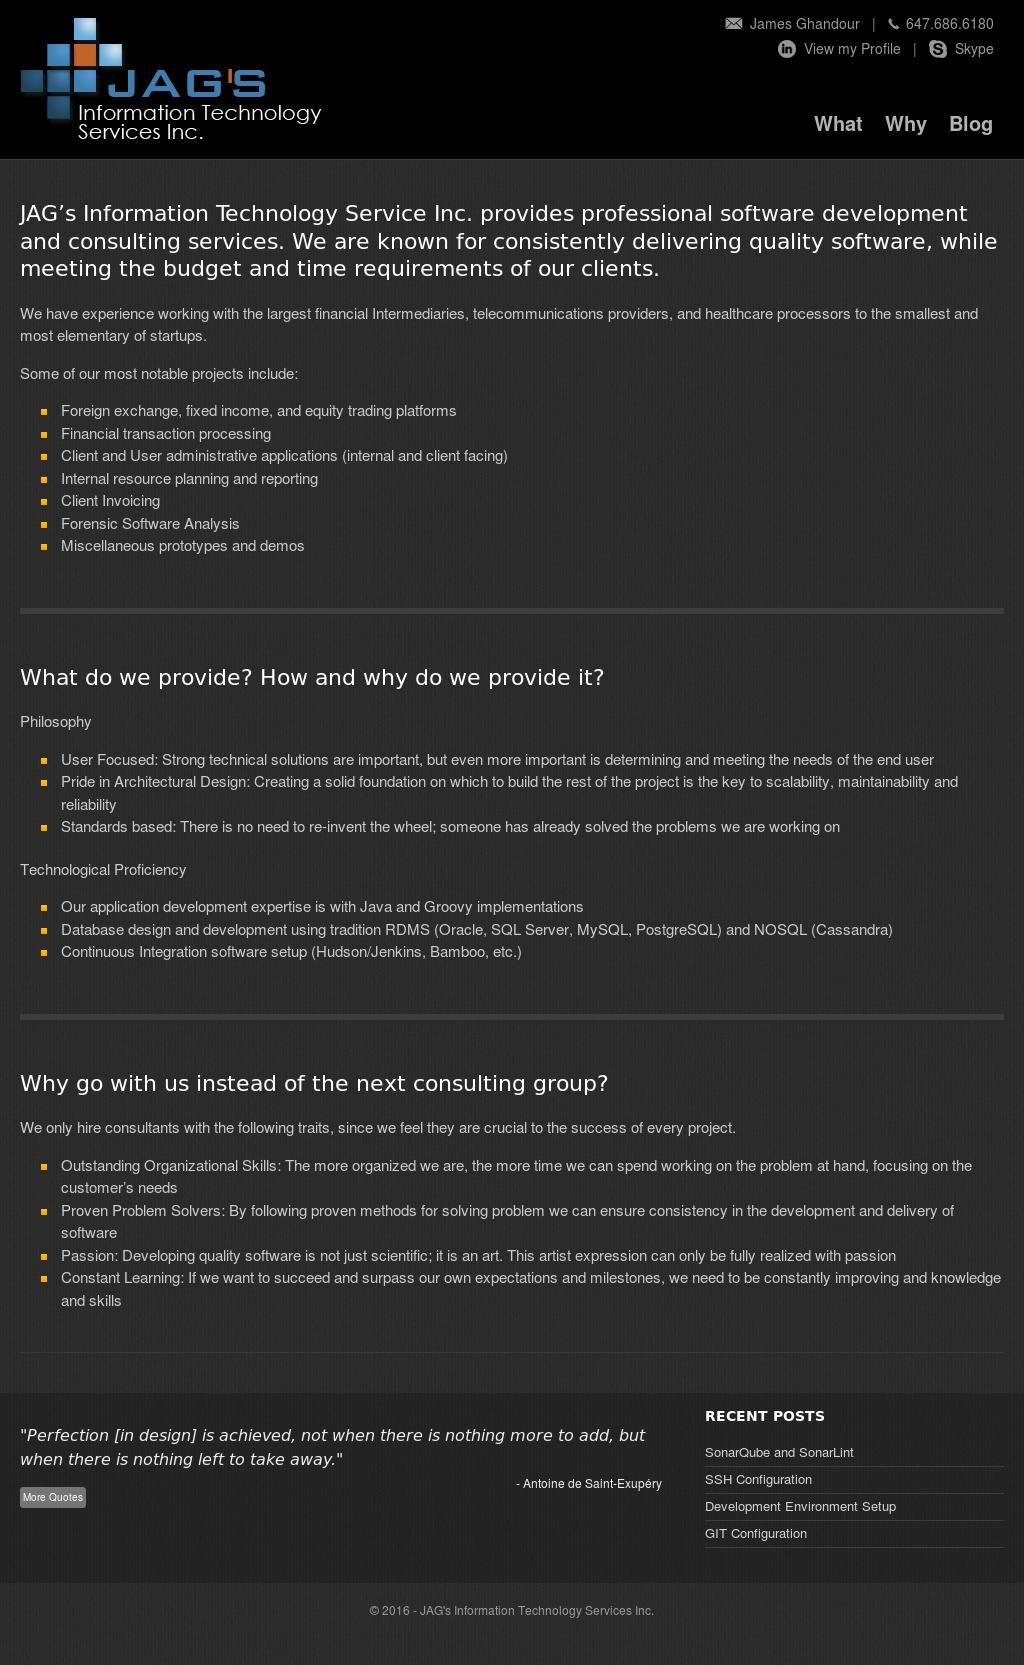 Jag's Information Technology Services Competitors, Revenue